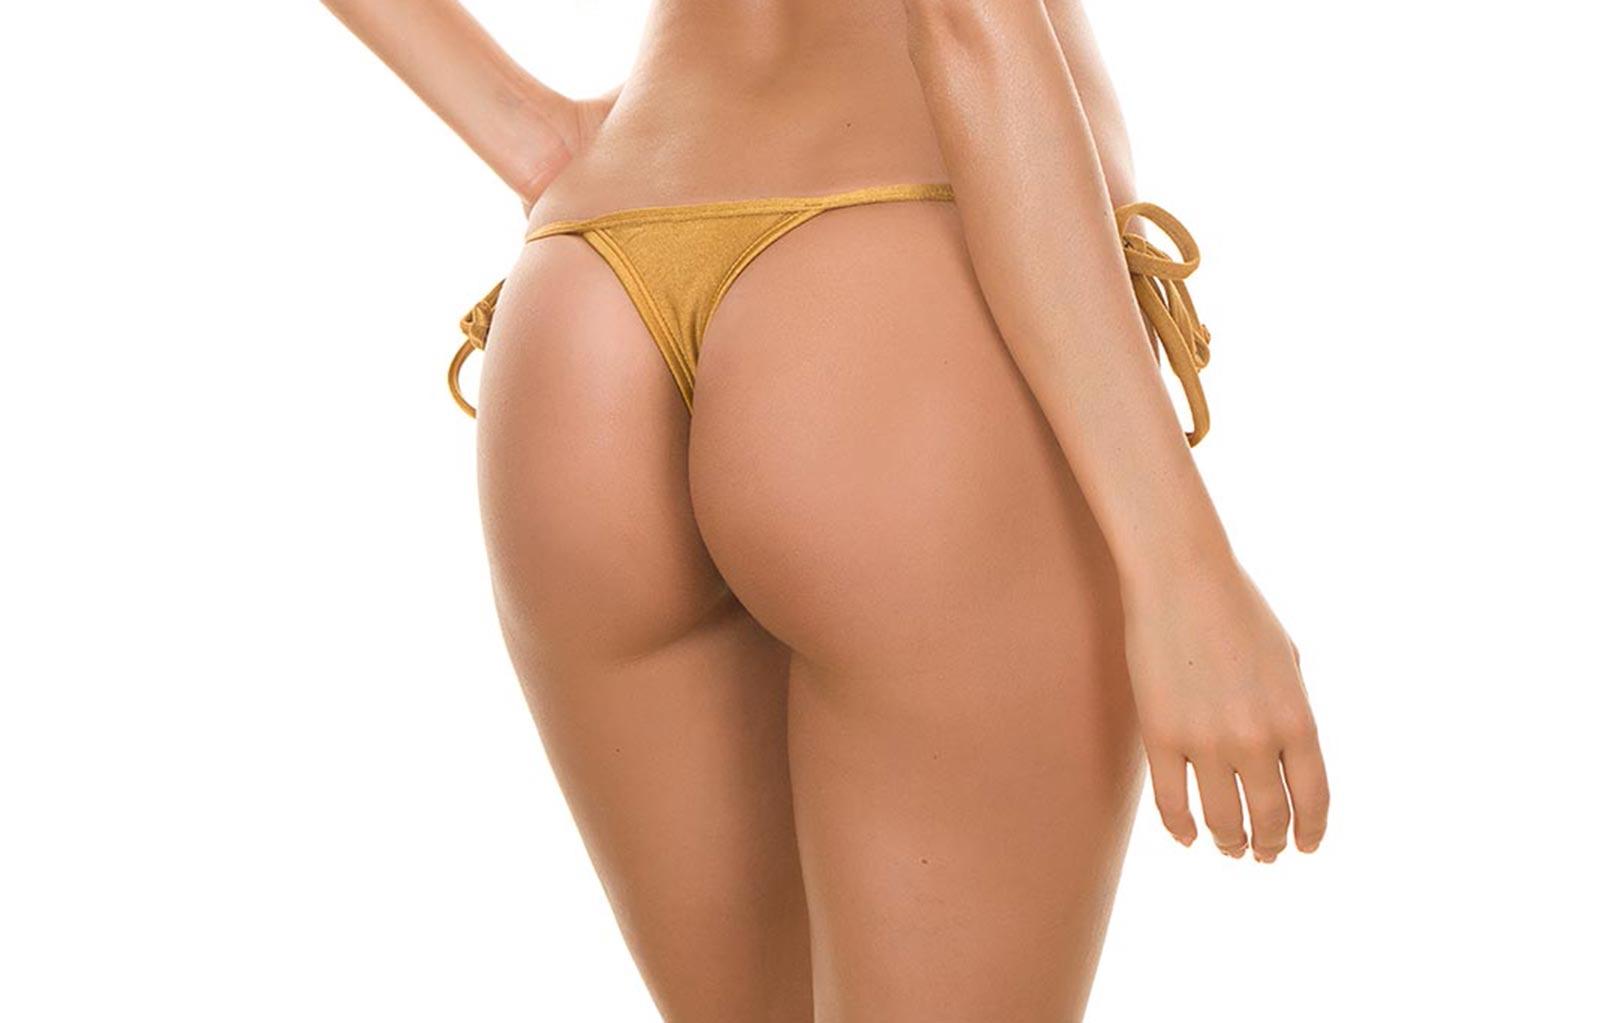 Tiny bikini wet pics, irma thurman nude